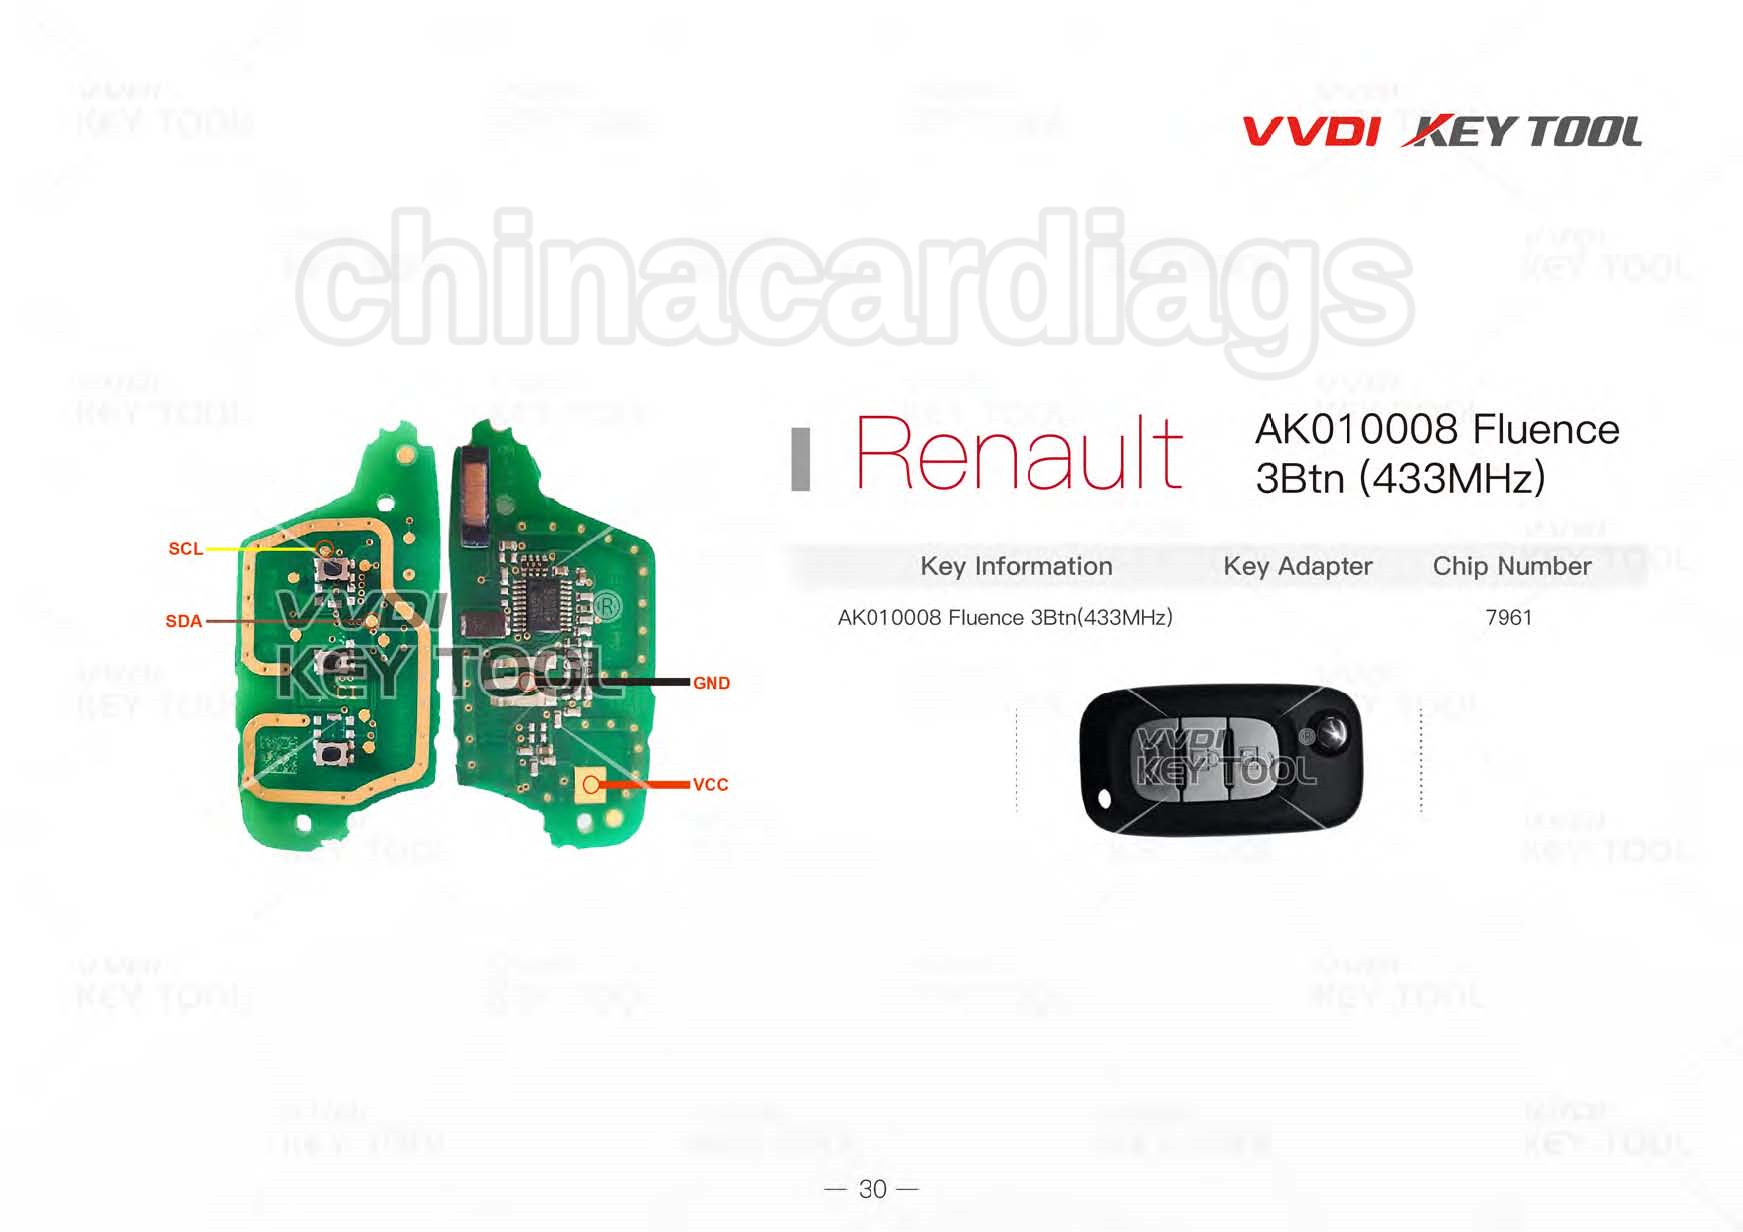 vvdi-key-tool-renew-diagram-30